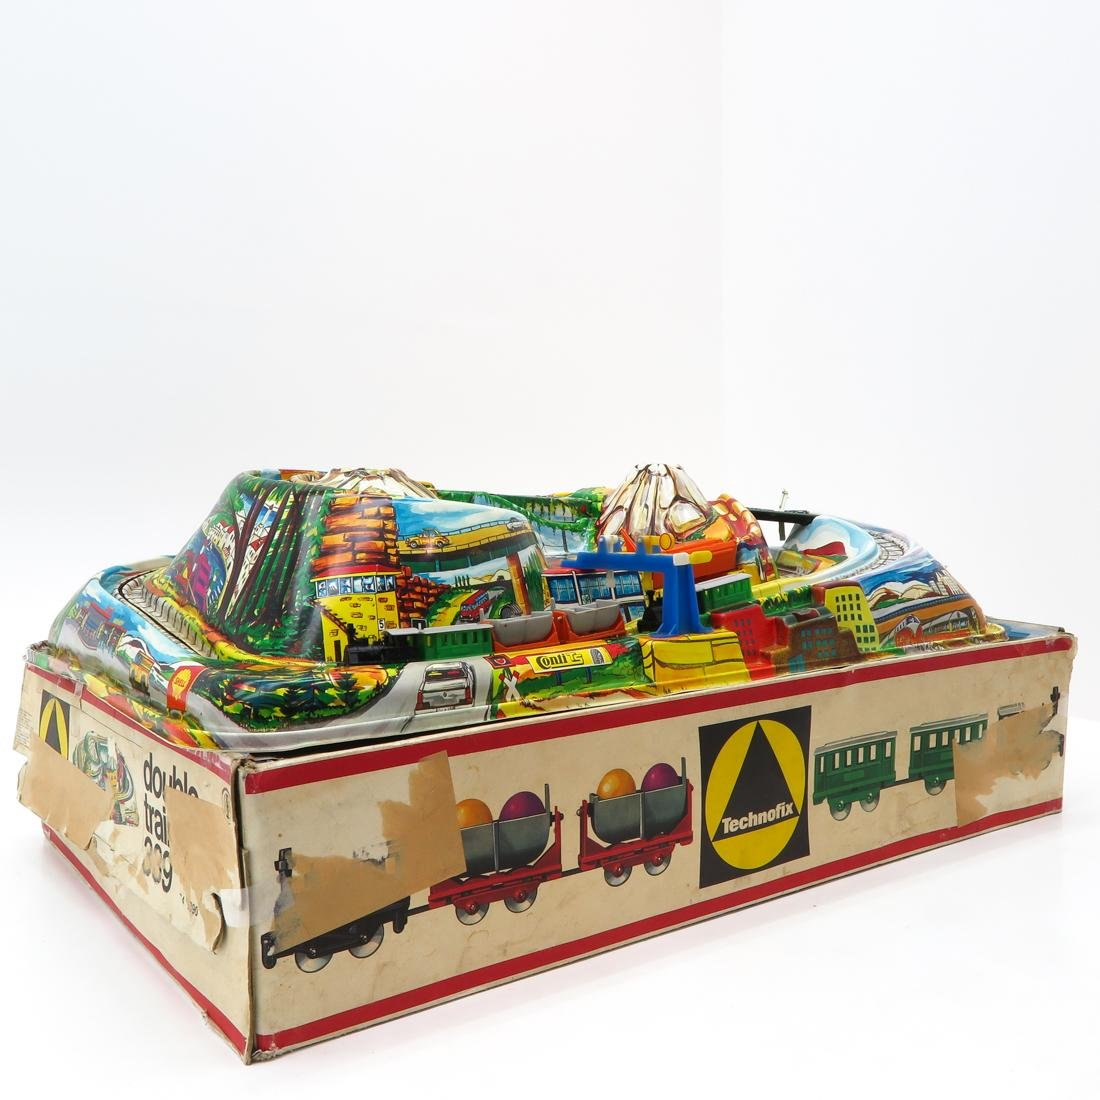 Vintage Technofix Train in Original Box - 2